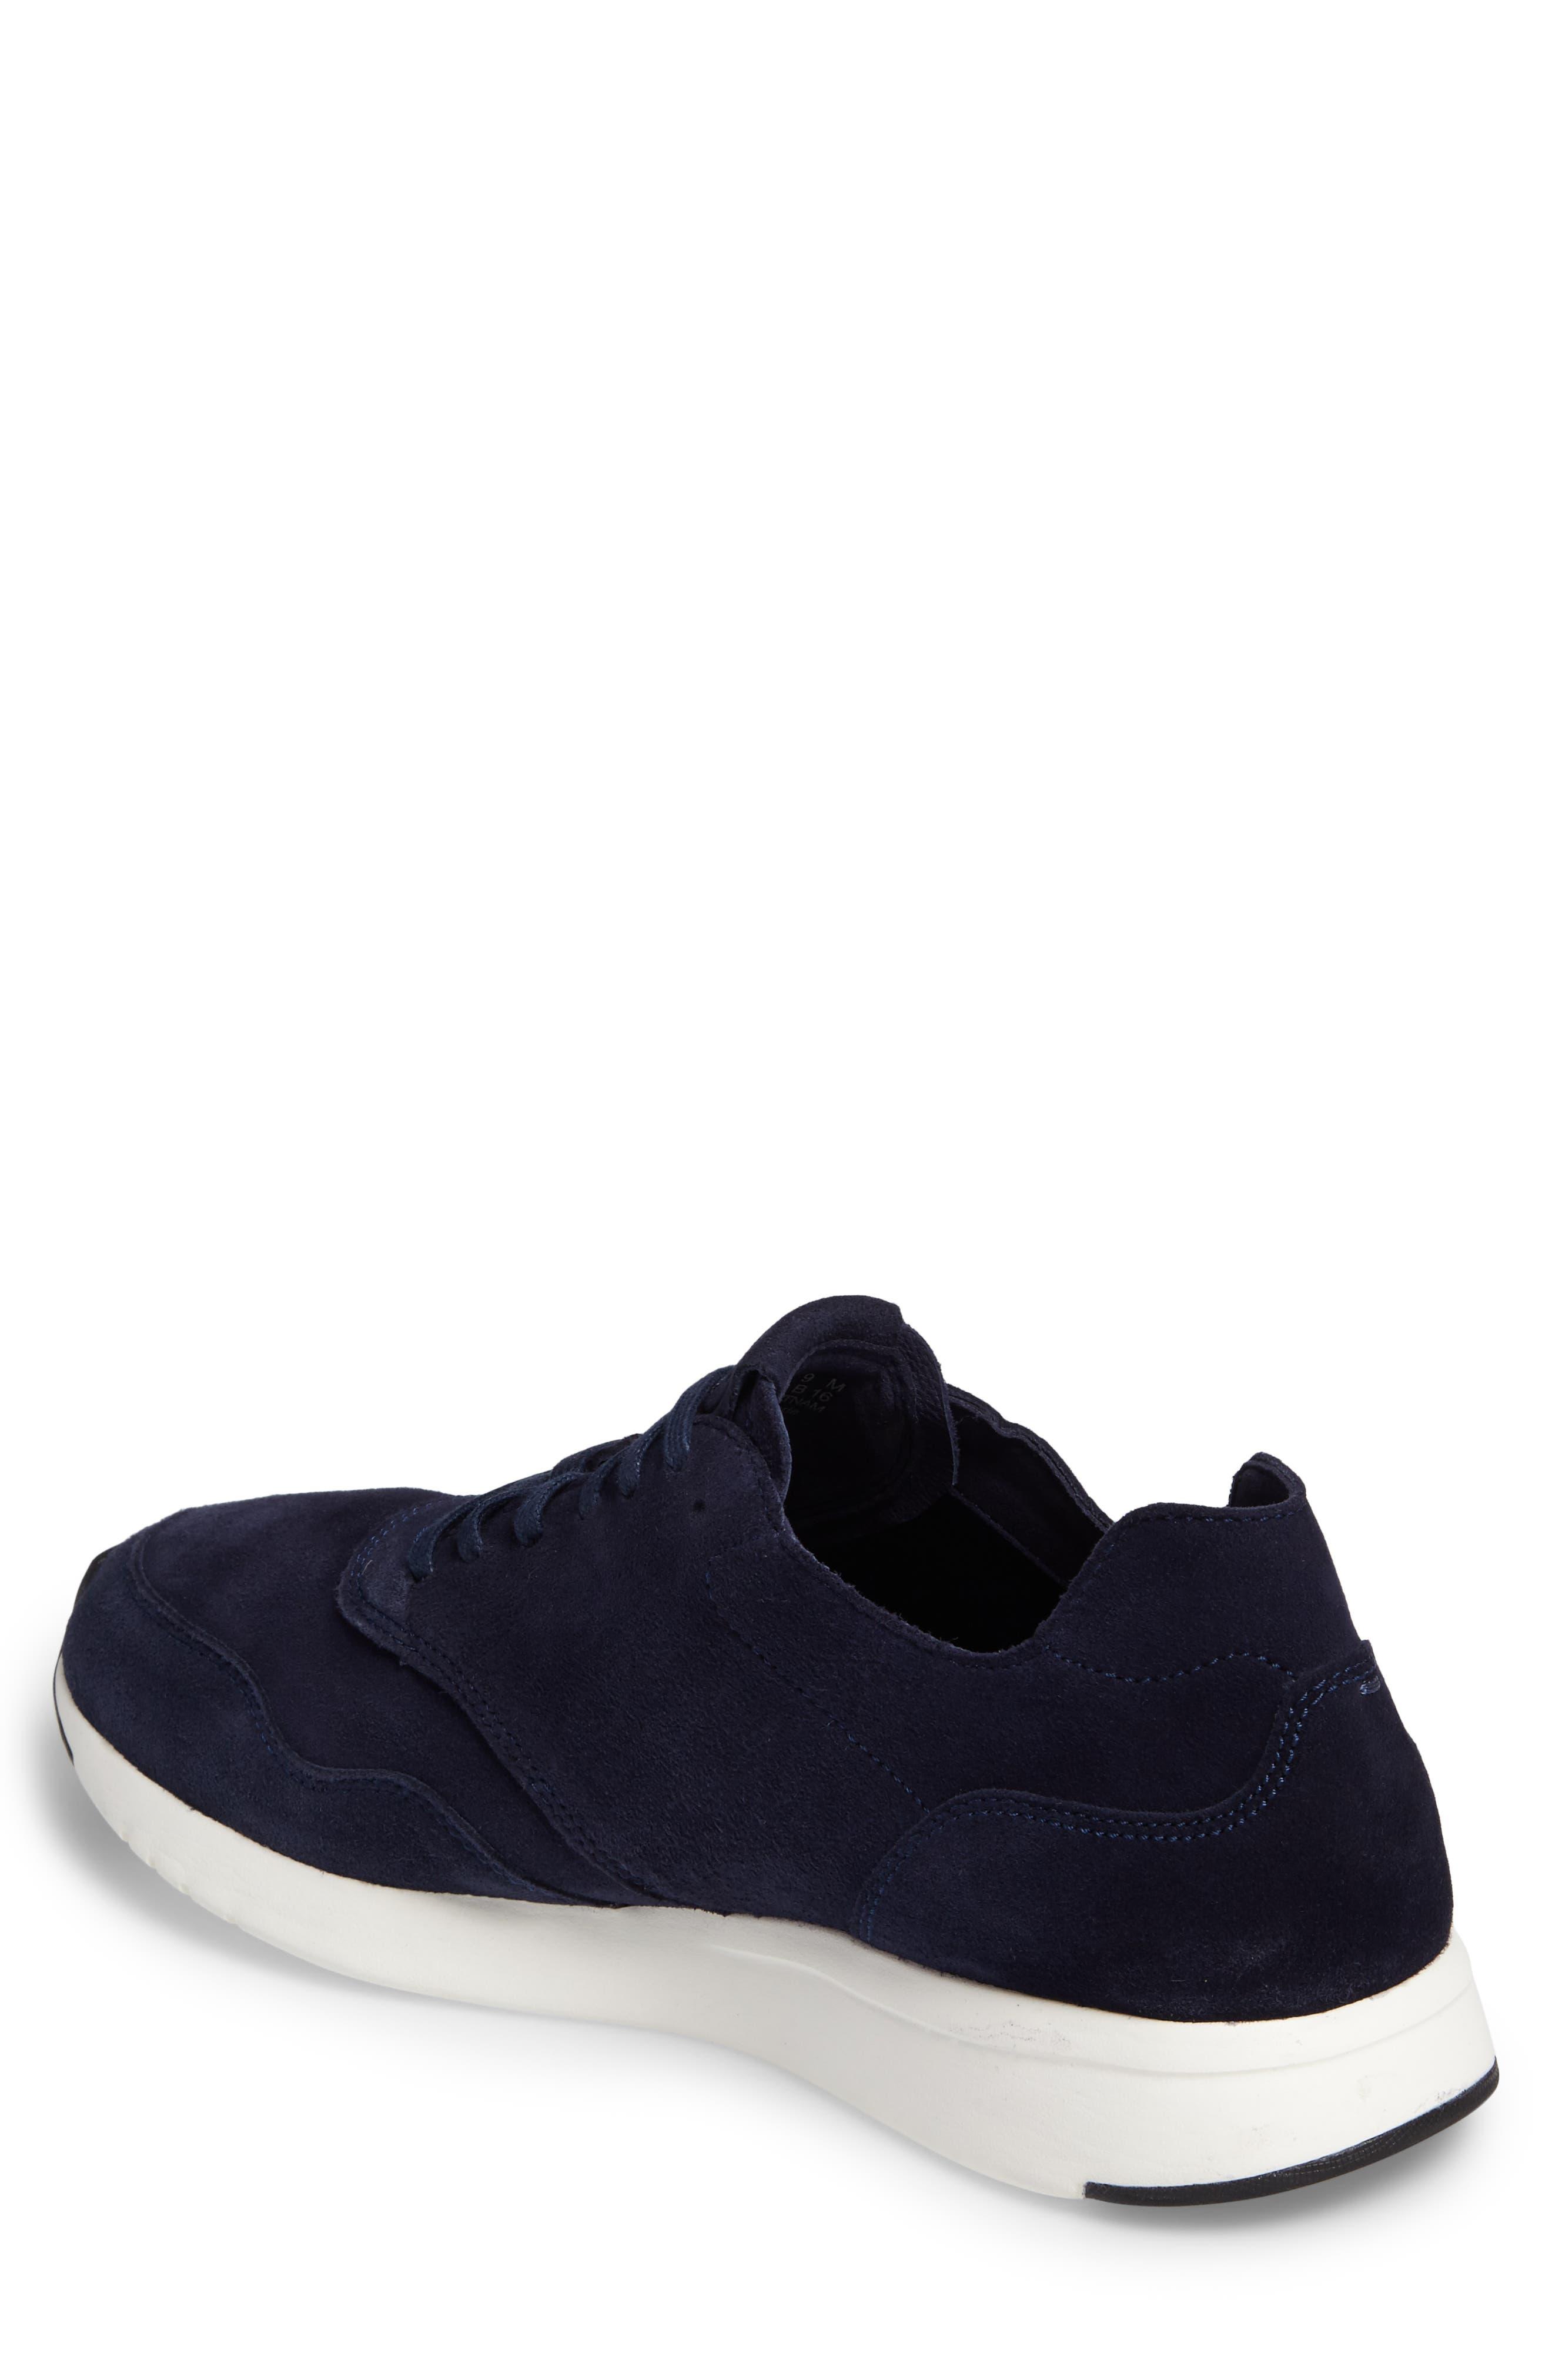 GrandPro DCon Sneaker,                             Alternate thumbnail 8, color,